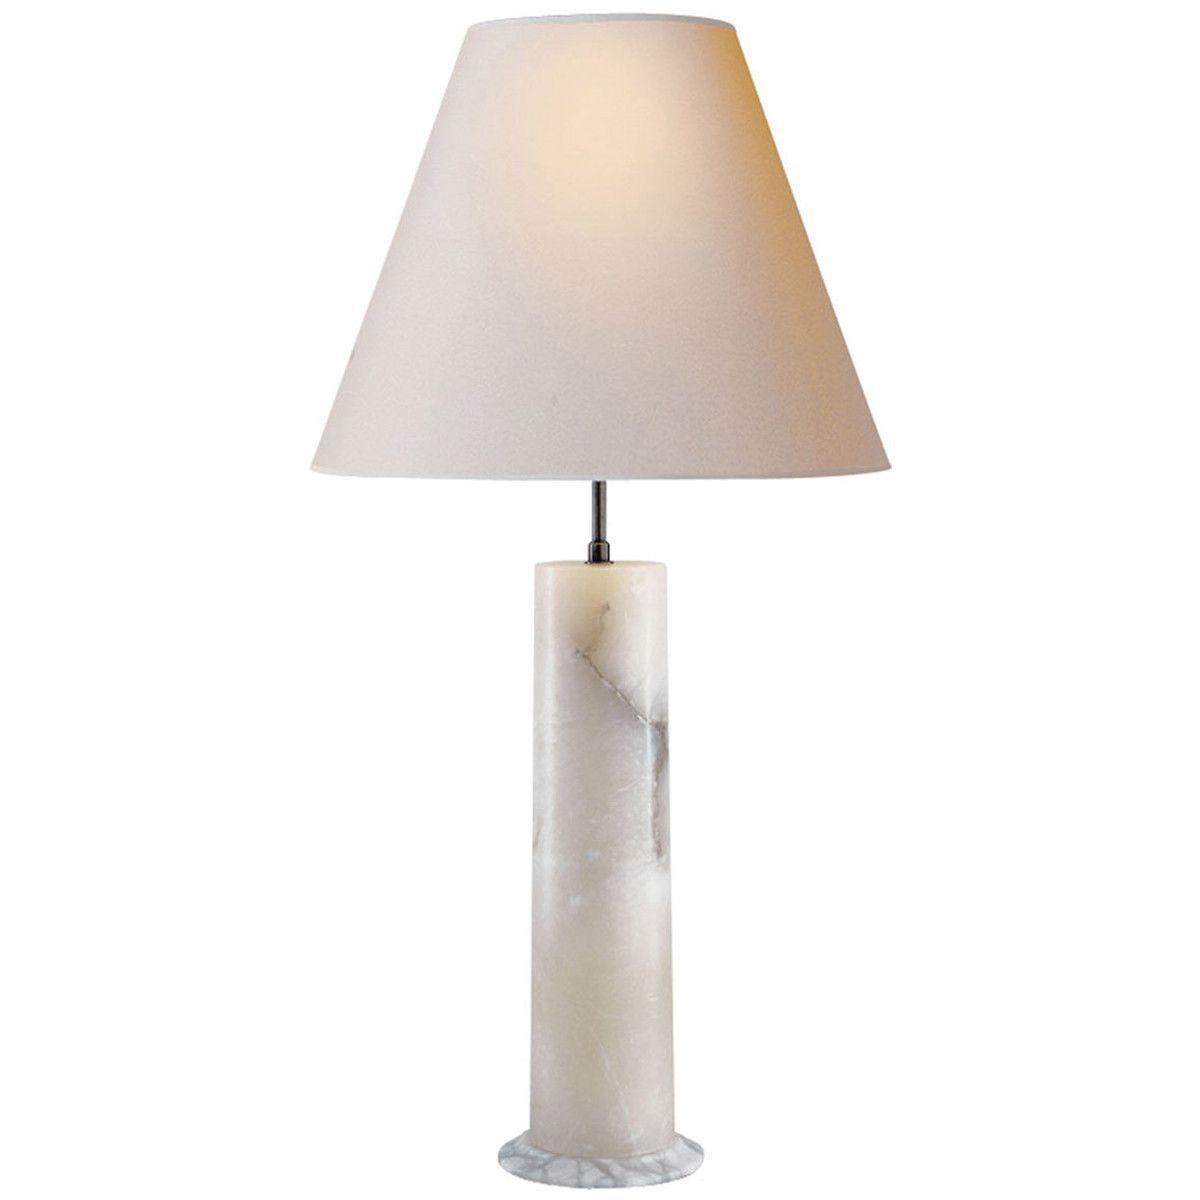 Visual comfort lighting thomas obrien london column table lamp visual comfort lighting thomas obrien london column table lamp geotapseo Choice Image